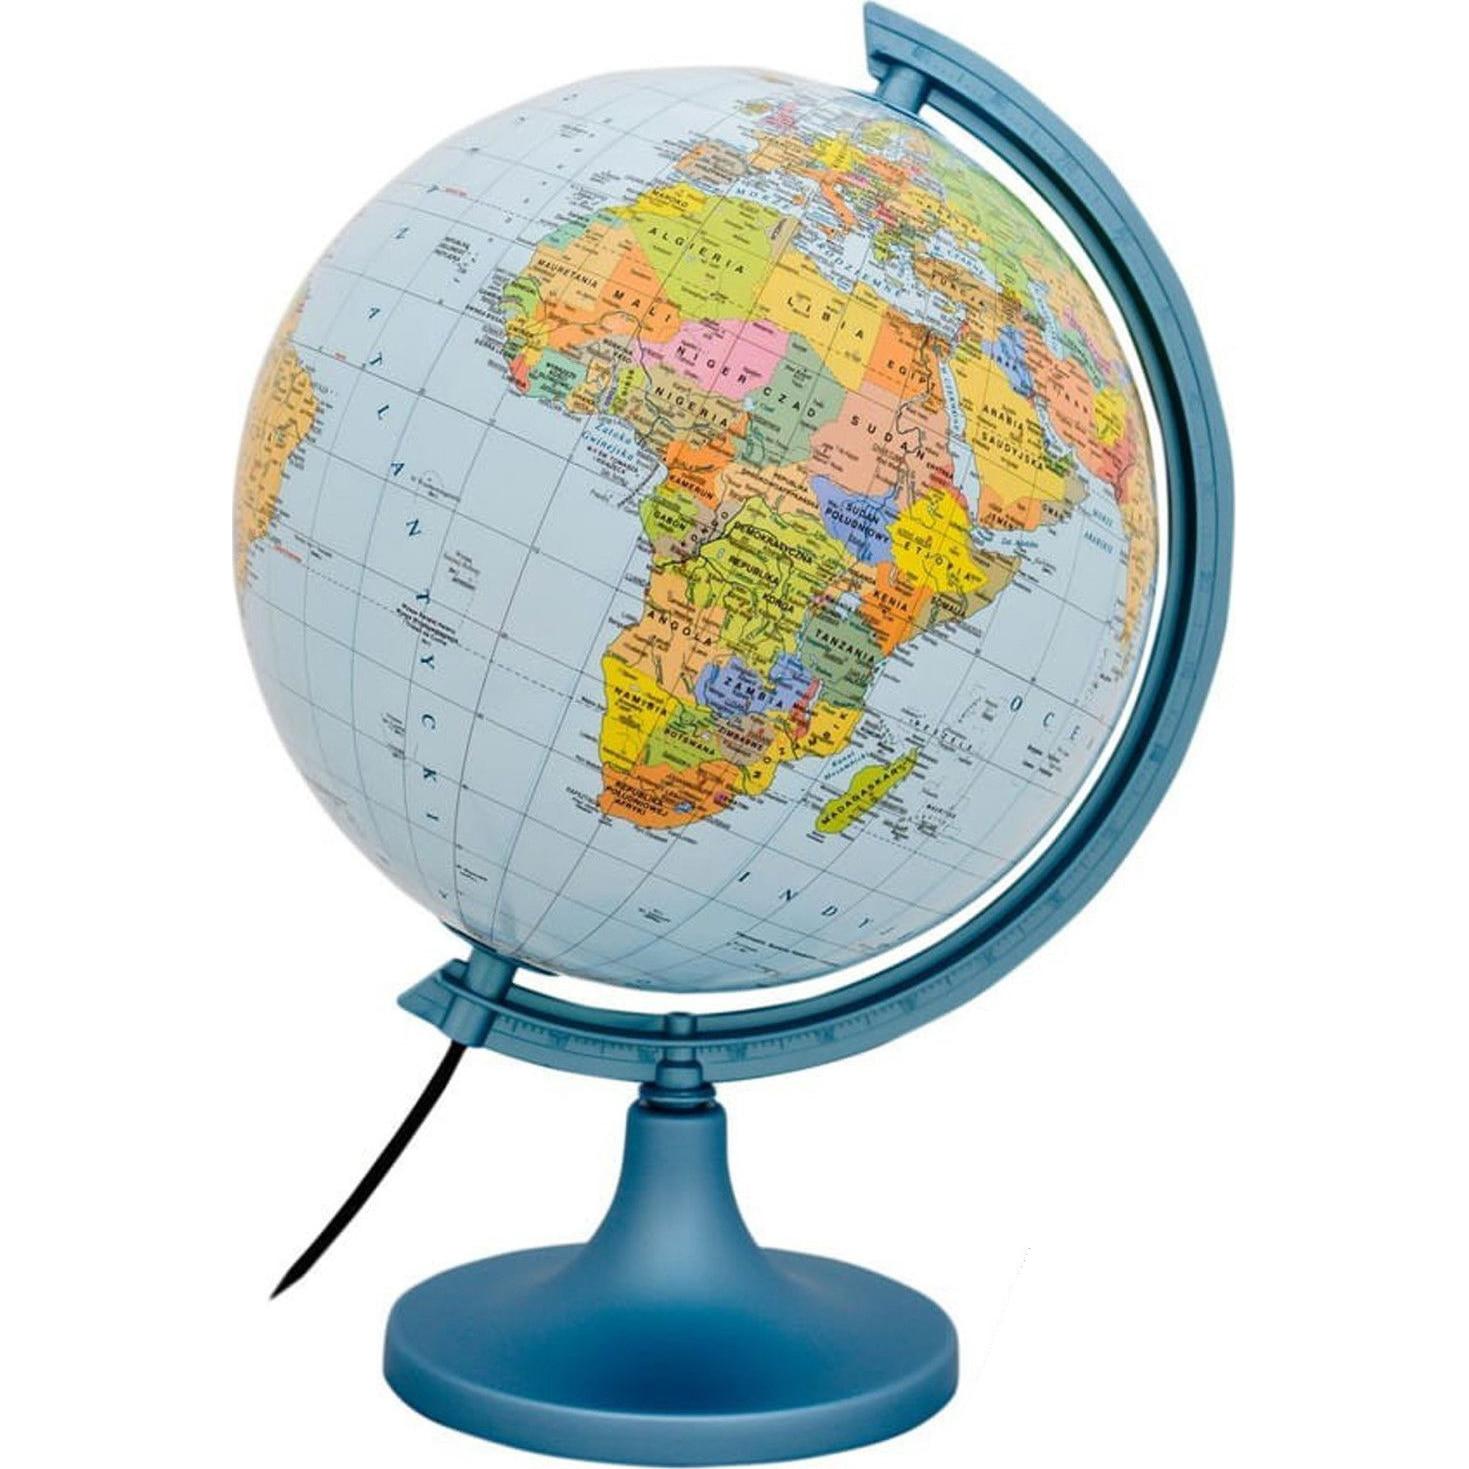 Fotografie Glob pamantesc iluminat 25 cm, harta politica si fizica, cartografie detaliata